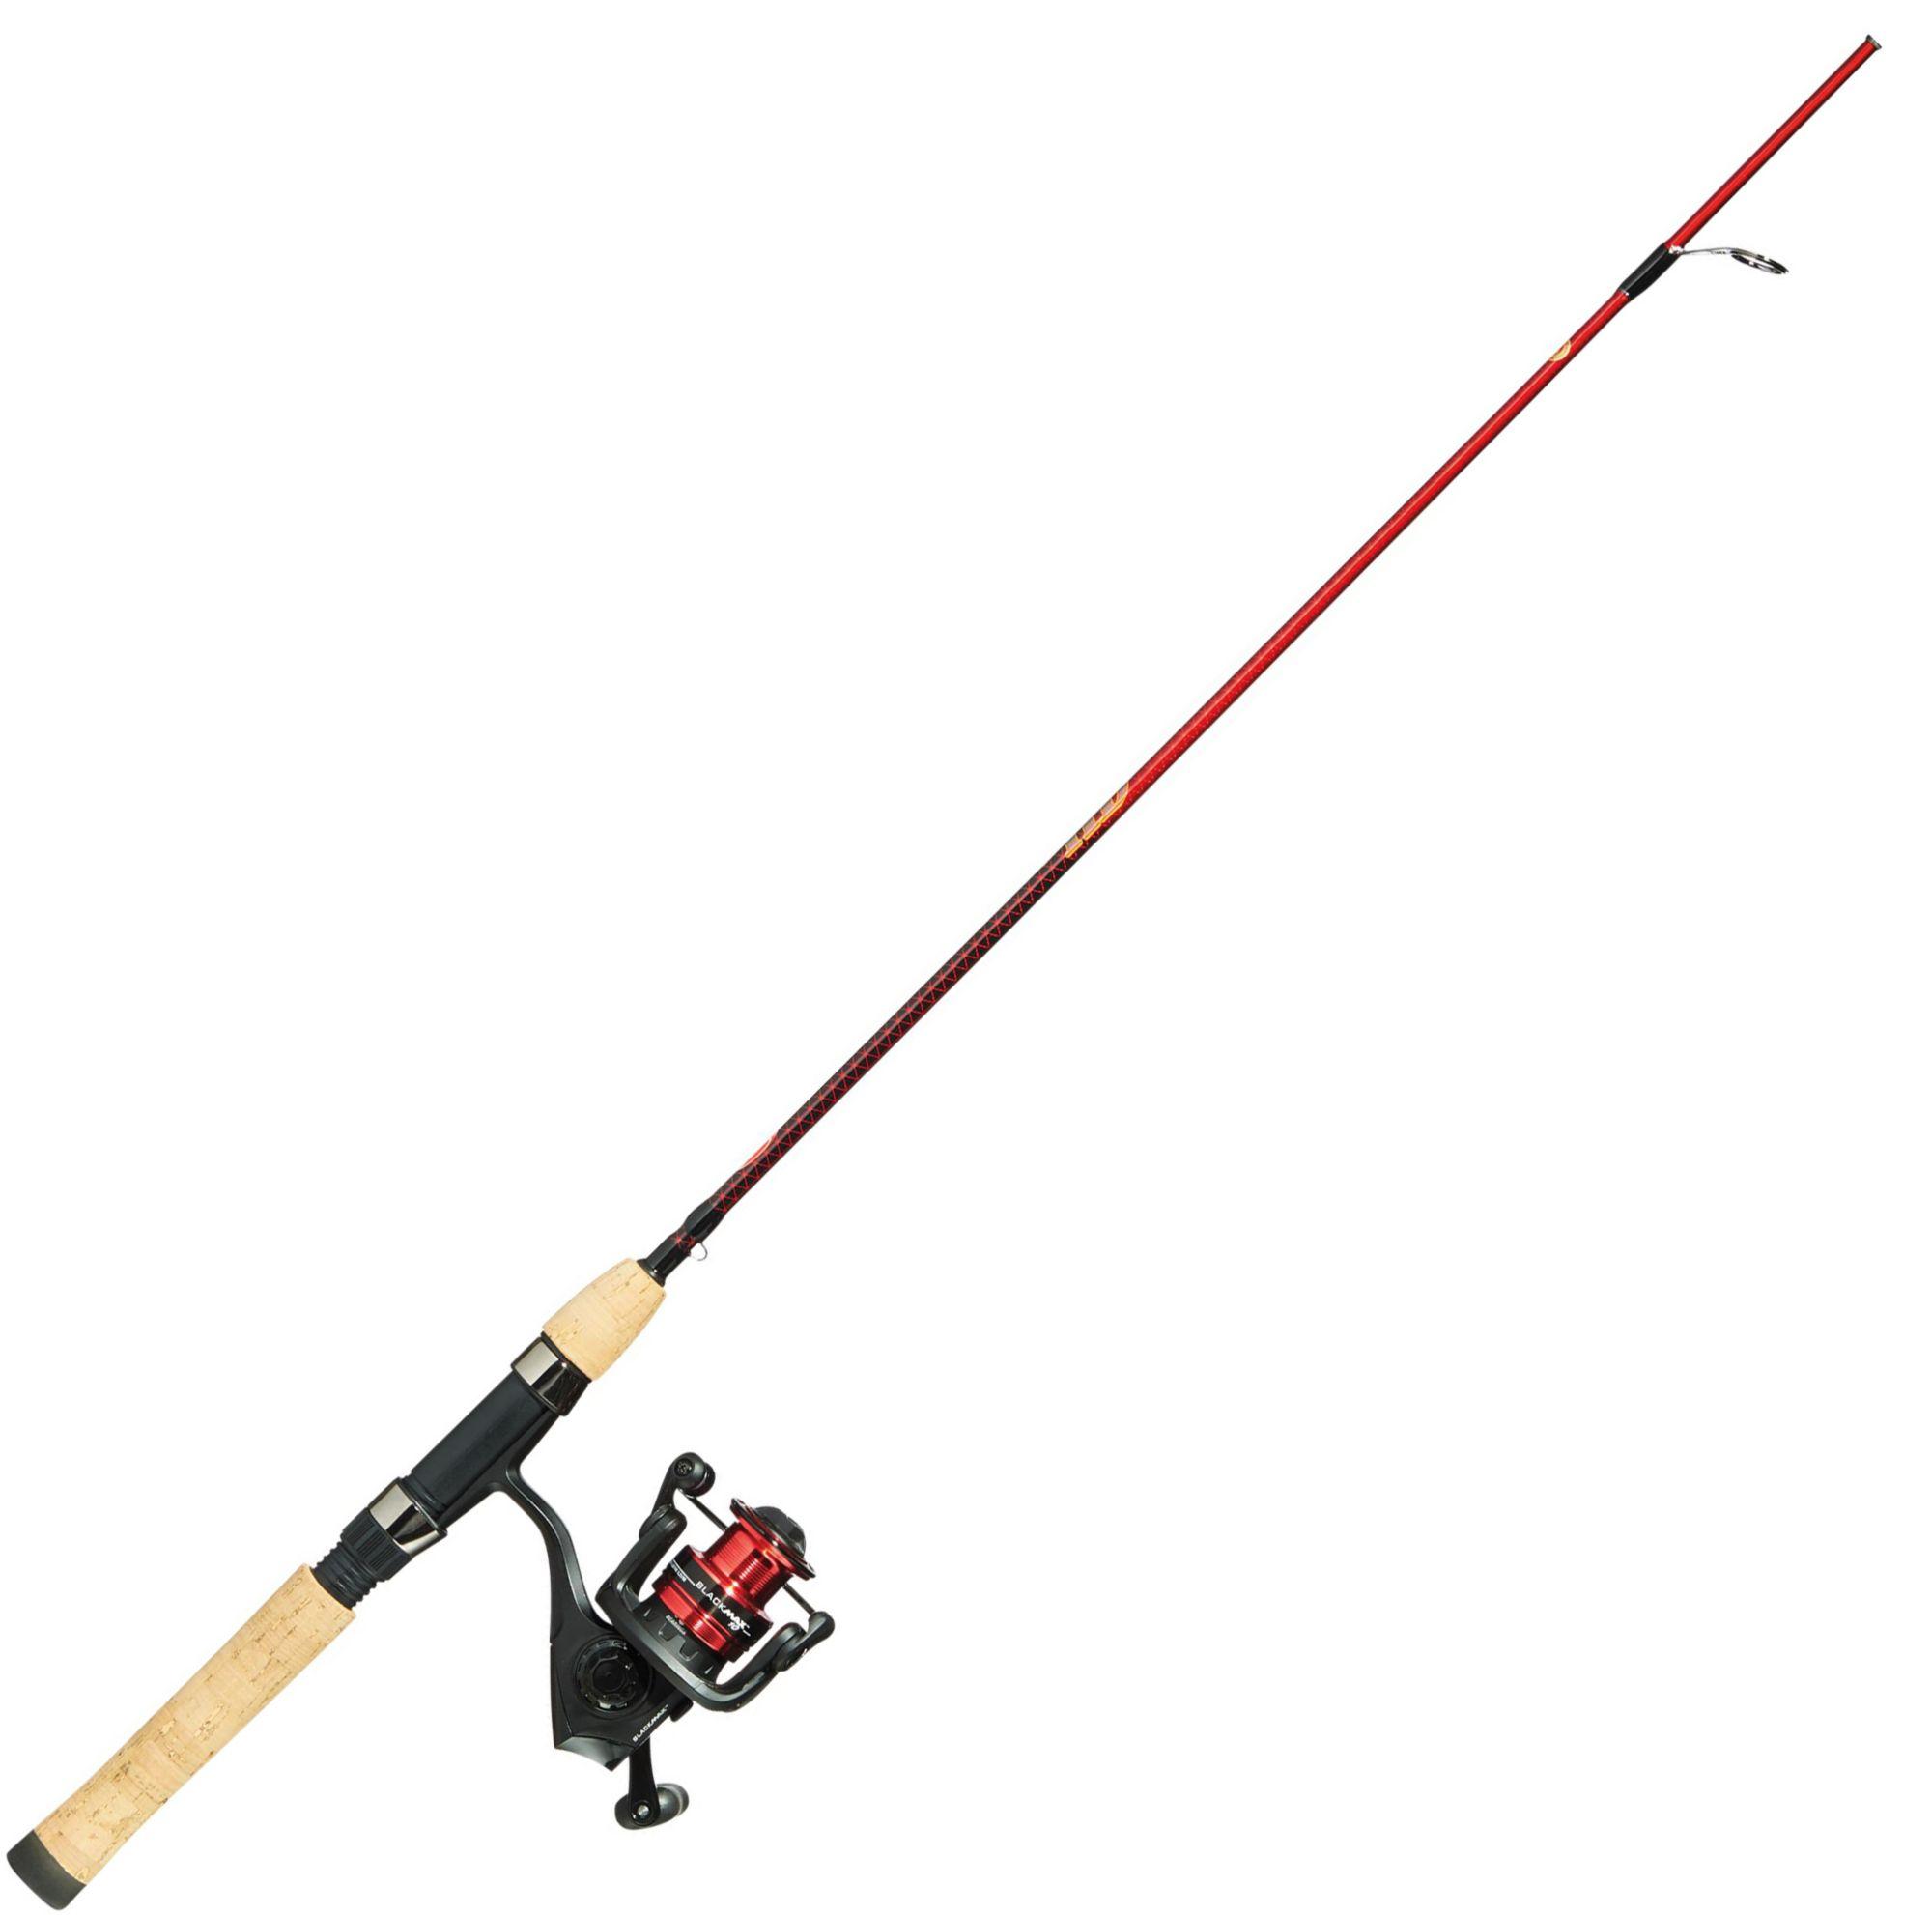 Berkley Cherrywood HD Black Max Fishing Rod and Reel Combo $19.98 AR